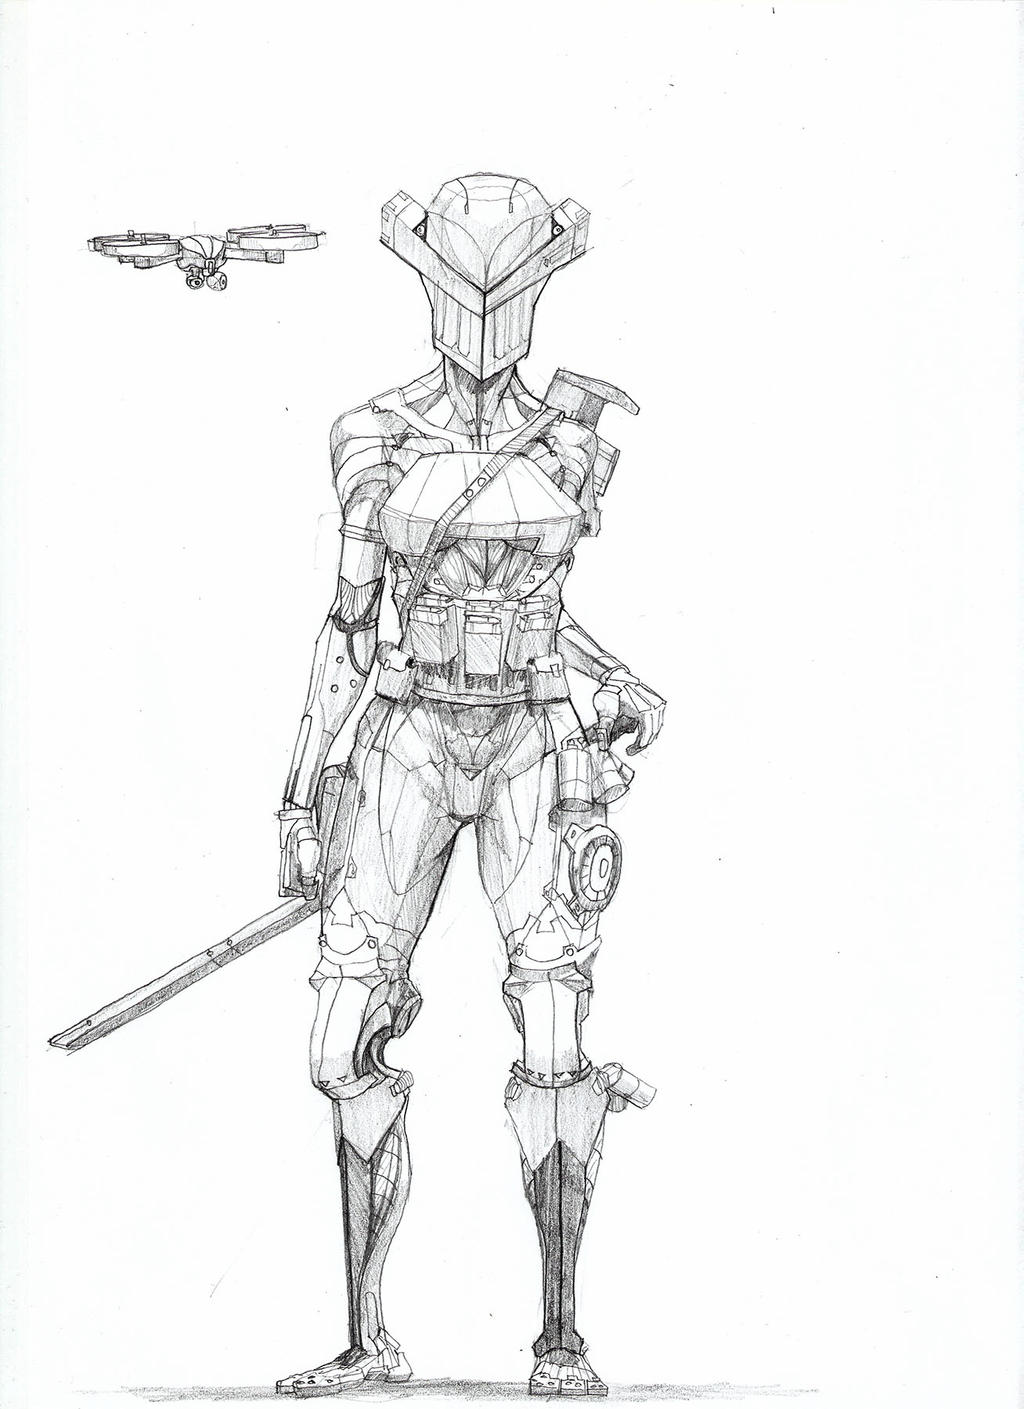 Armed cyborg by Rievil